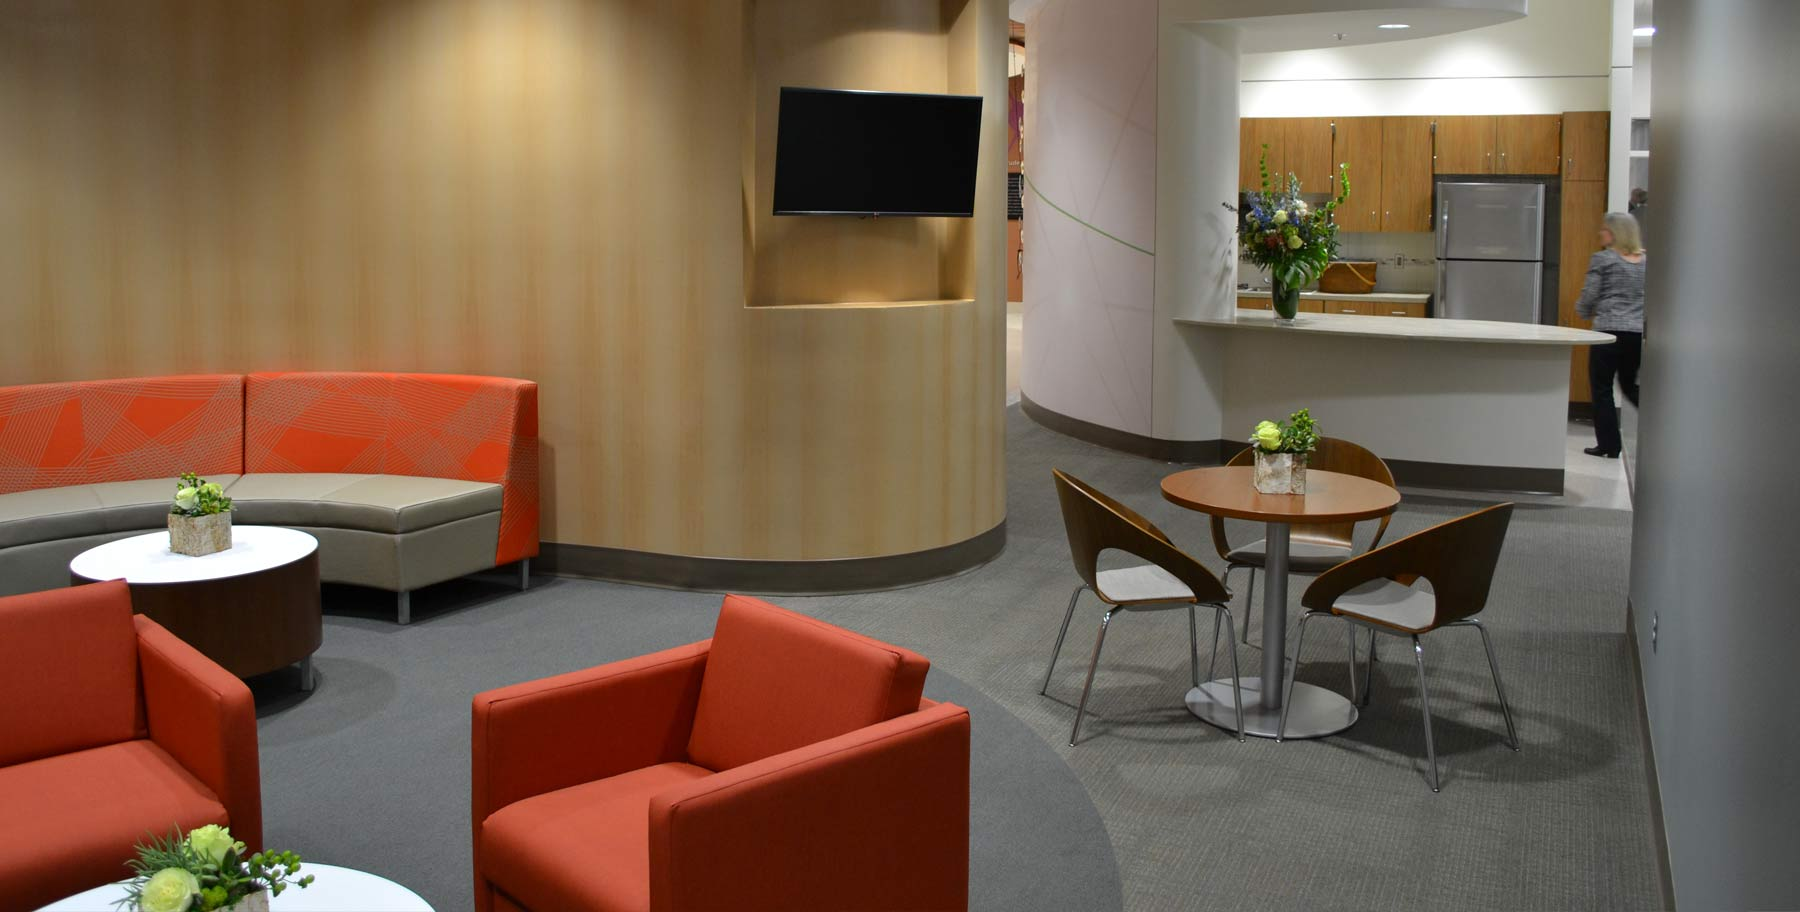 UMMC Translational Research Center Waiting Area | Flad Architects